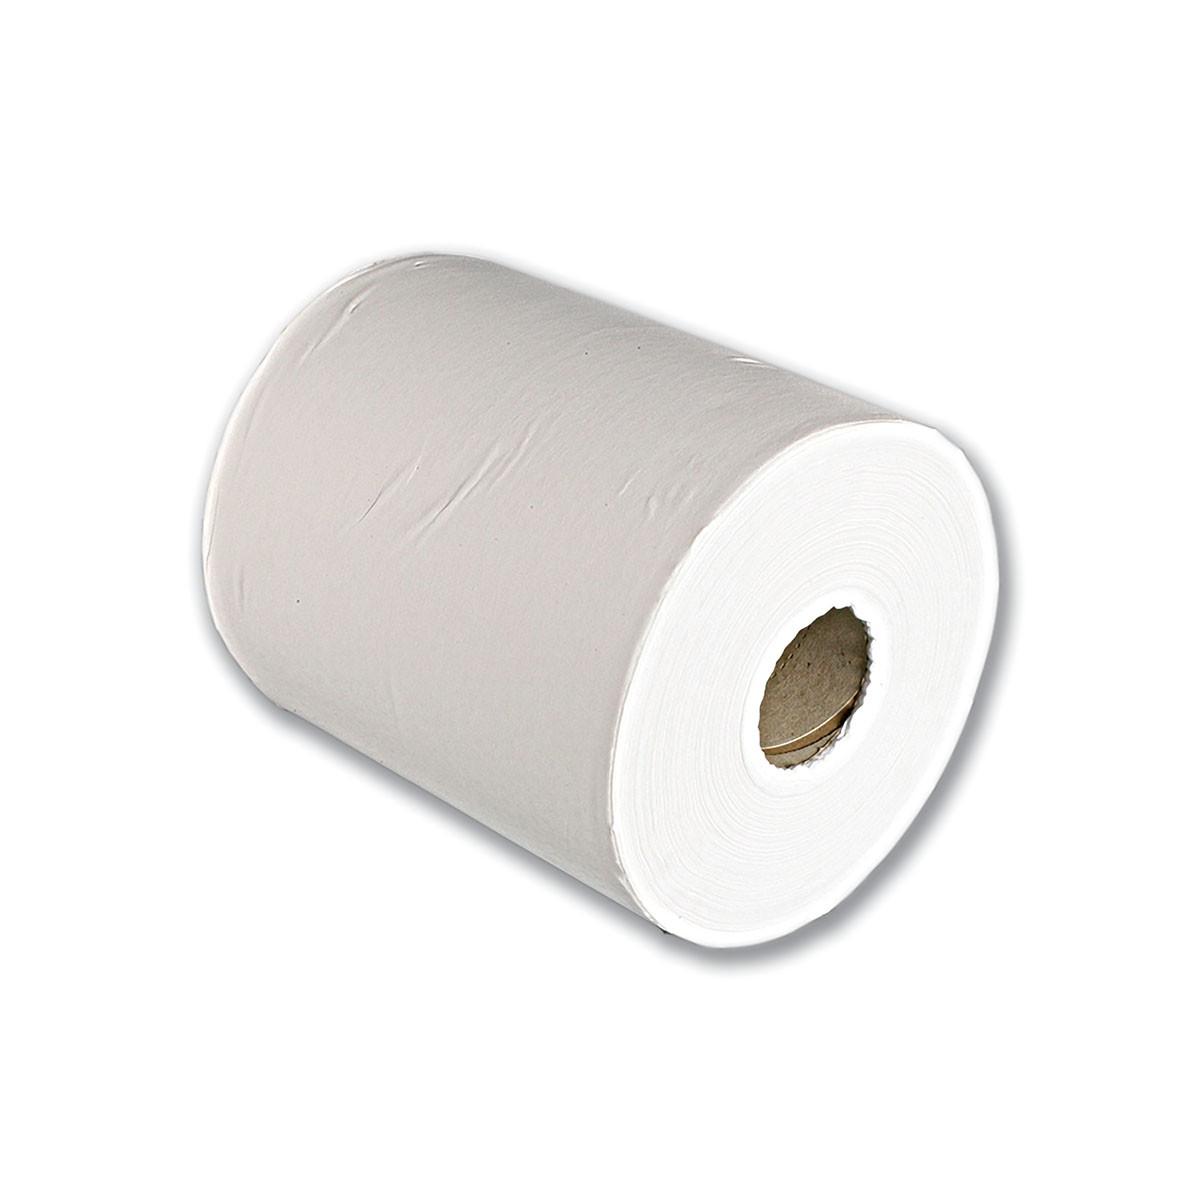 2-Ply Paper Maxi Roll 22.5cmx950gms - Embossed | 6rls/ctn